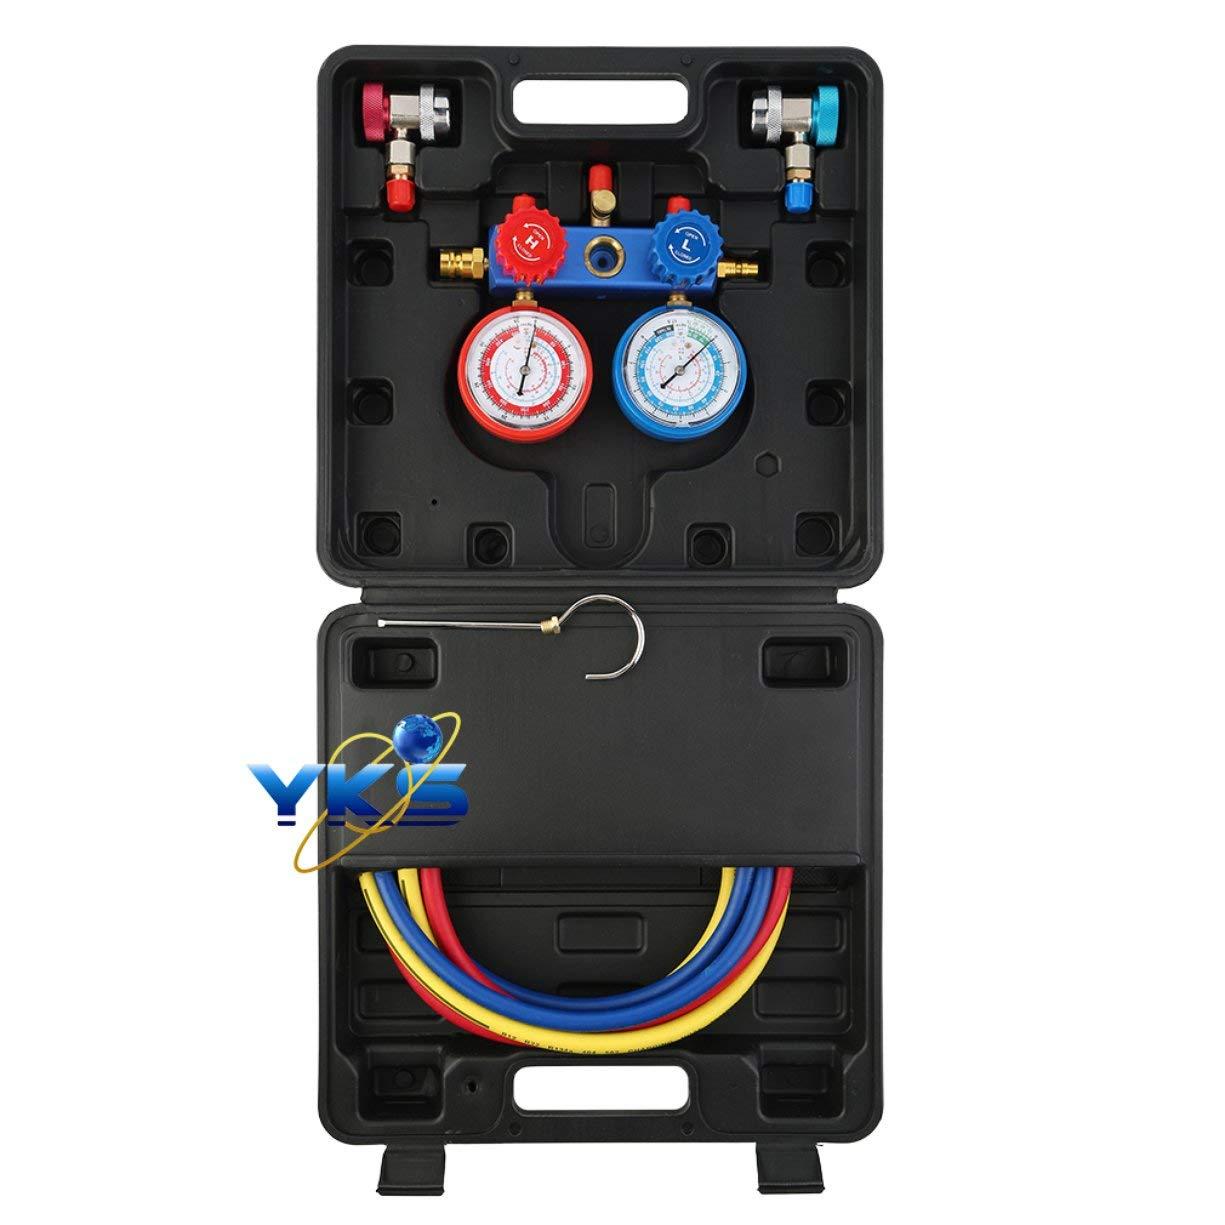 Practical AC R134a Quick Couplers Aluminumr Manifold Gauge QC13 Adapter Tool Set Kit